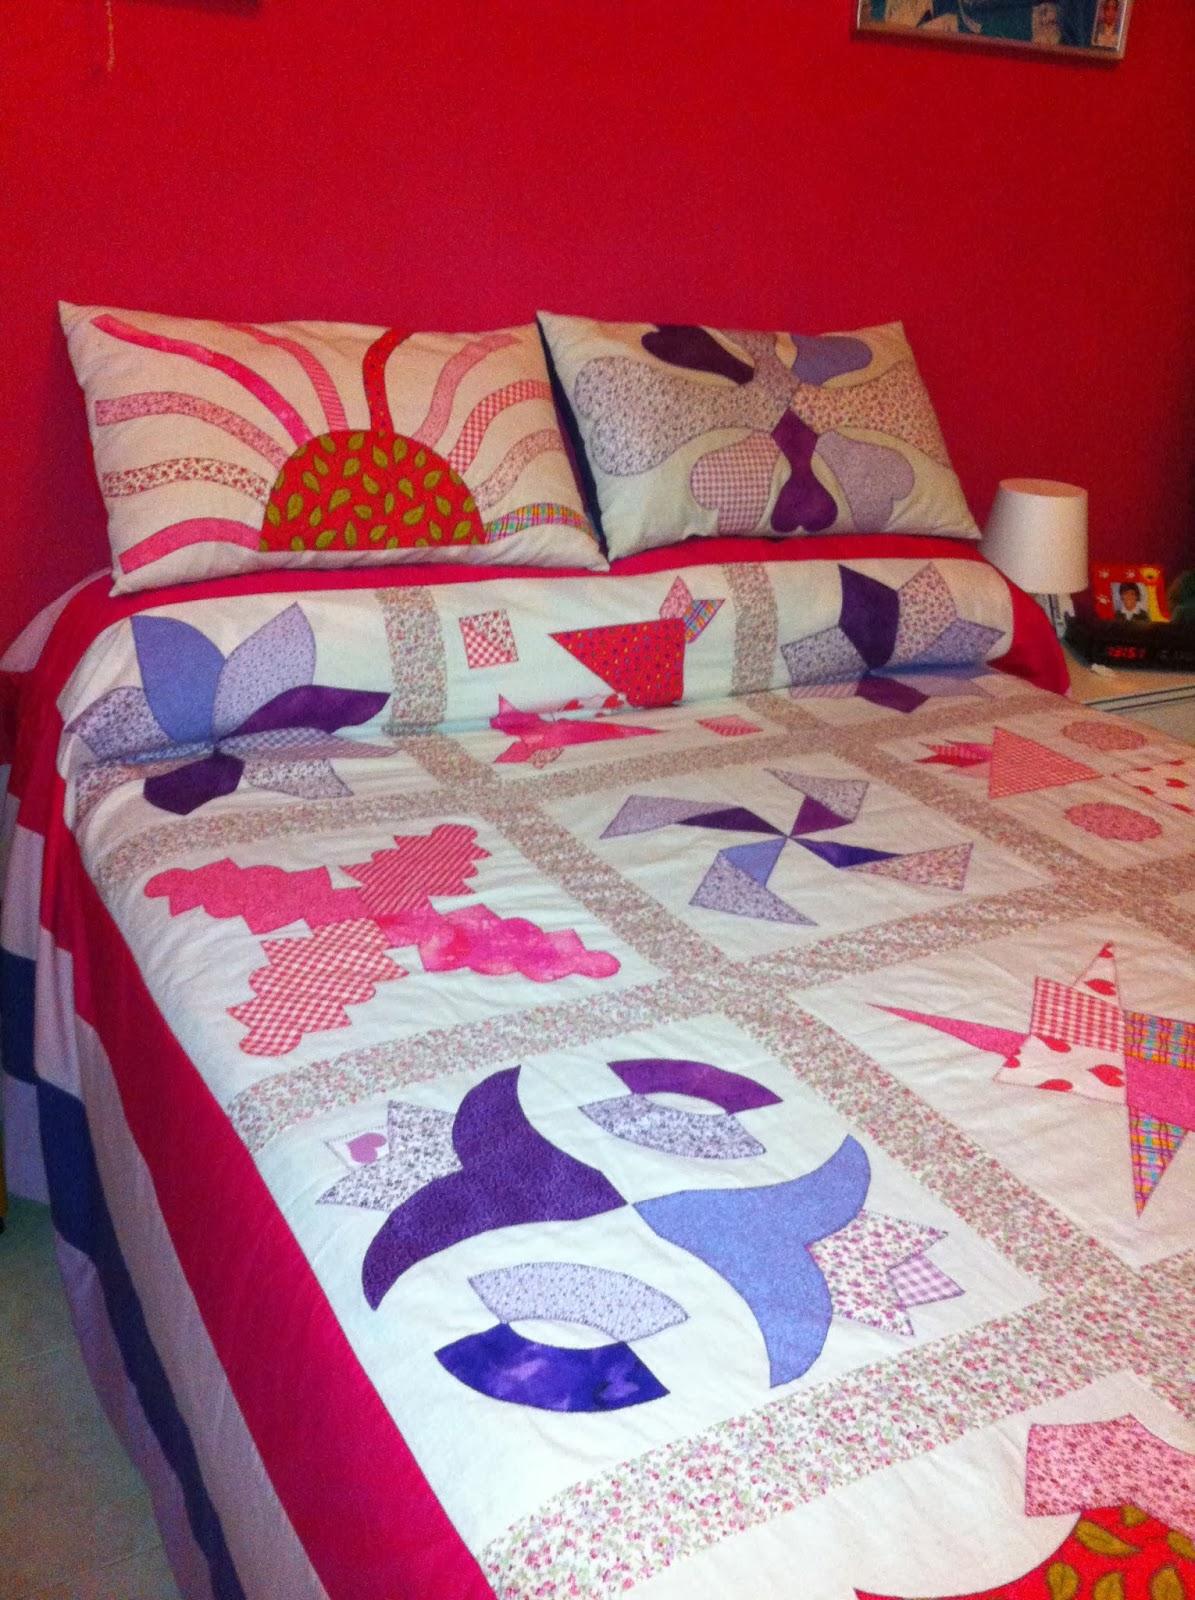 Las cositas de mary sanchez colcha de patchwork cama de matrimonio - Colcha patchwork ...